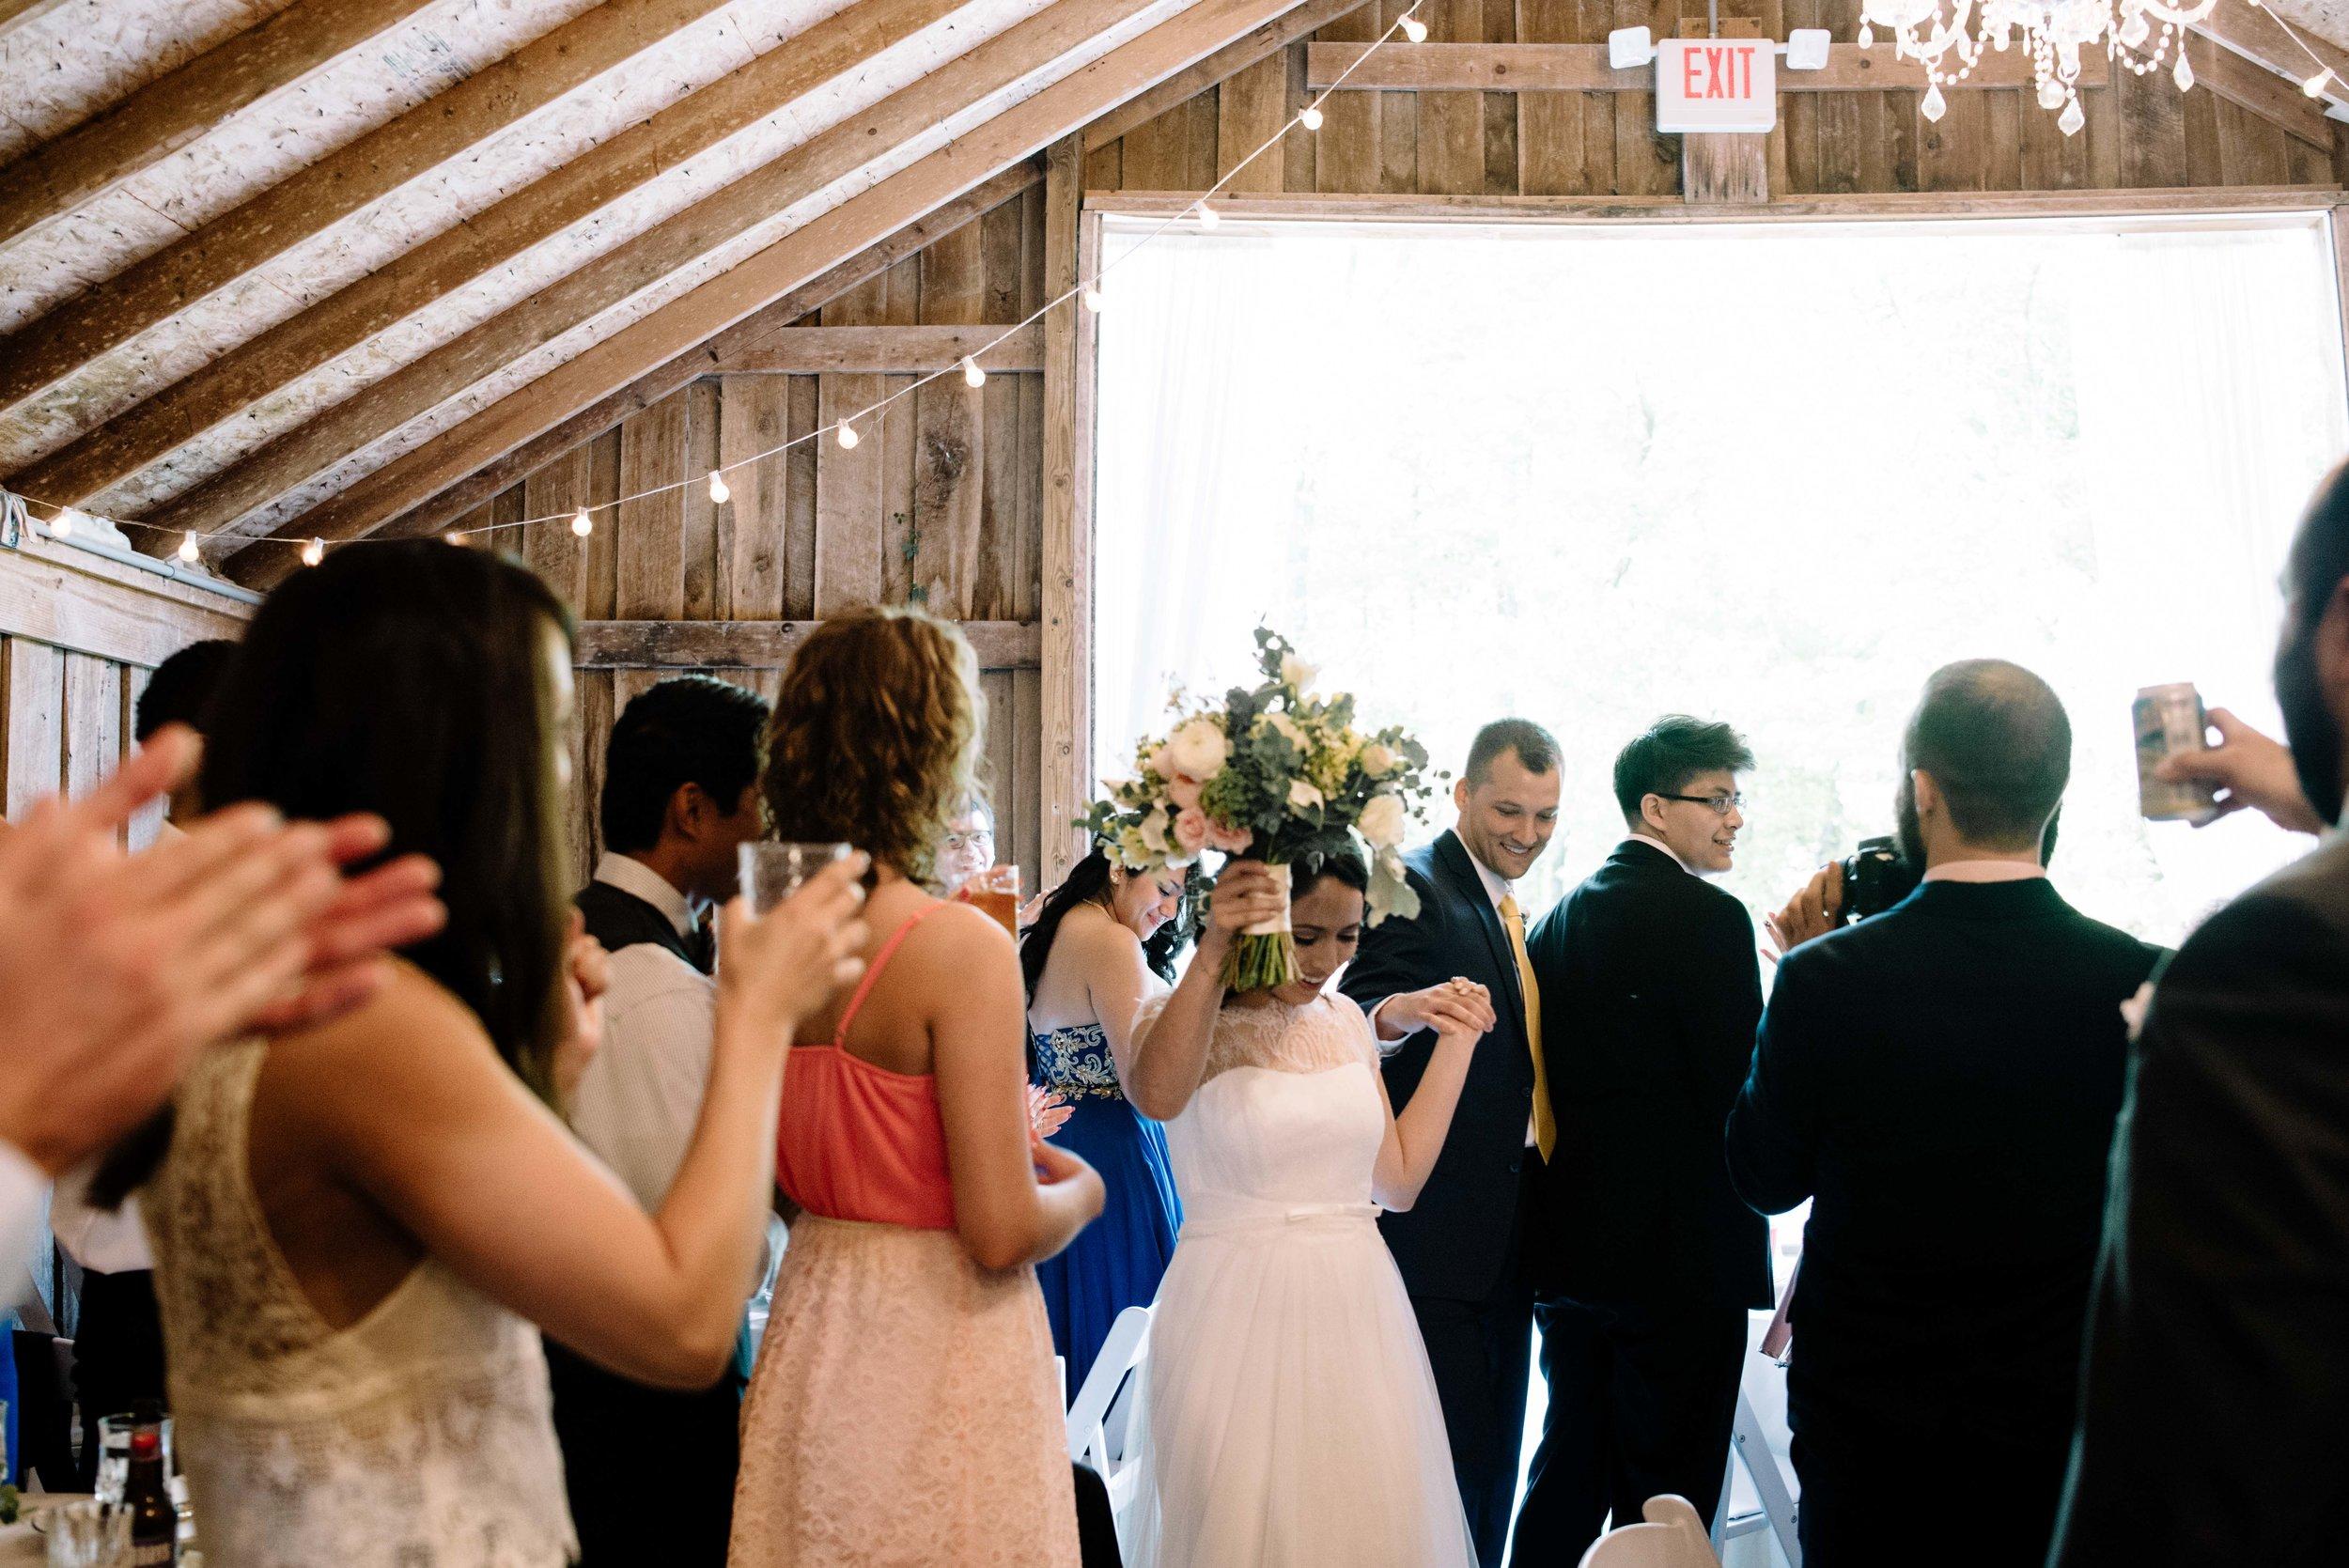 Ana-Dan-Blog-Indianapolis-Wedding-76.jpg